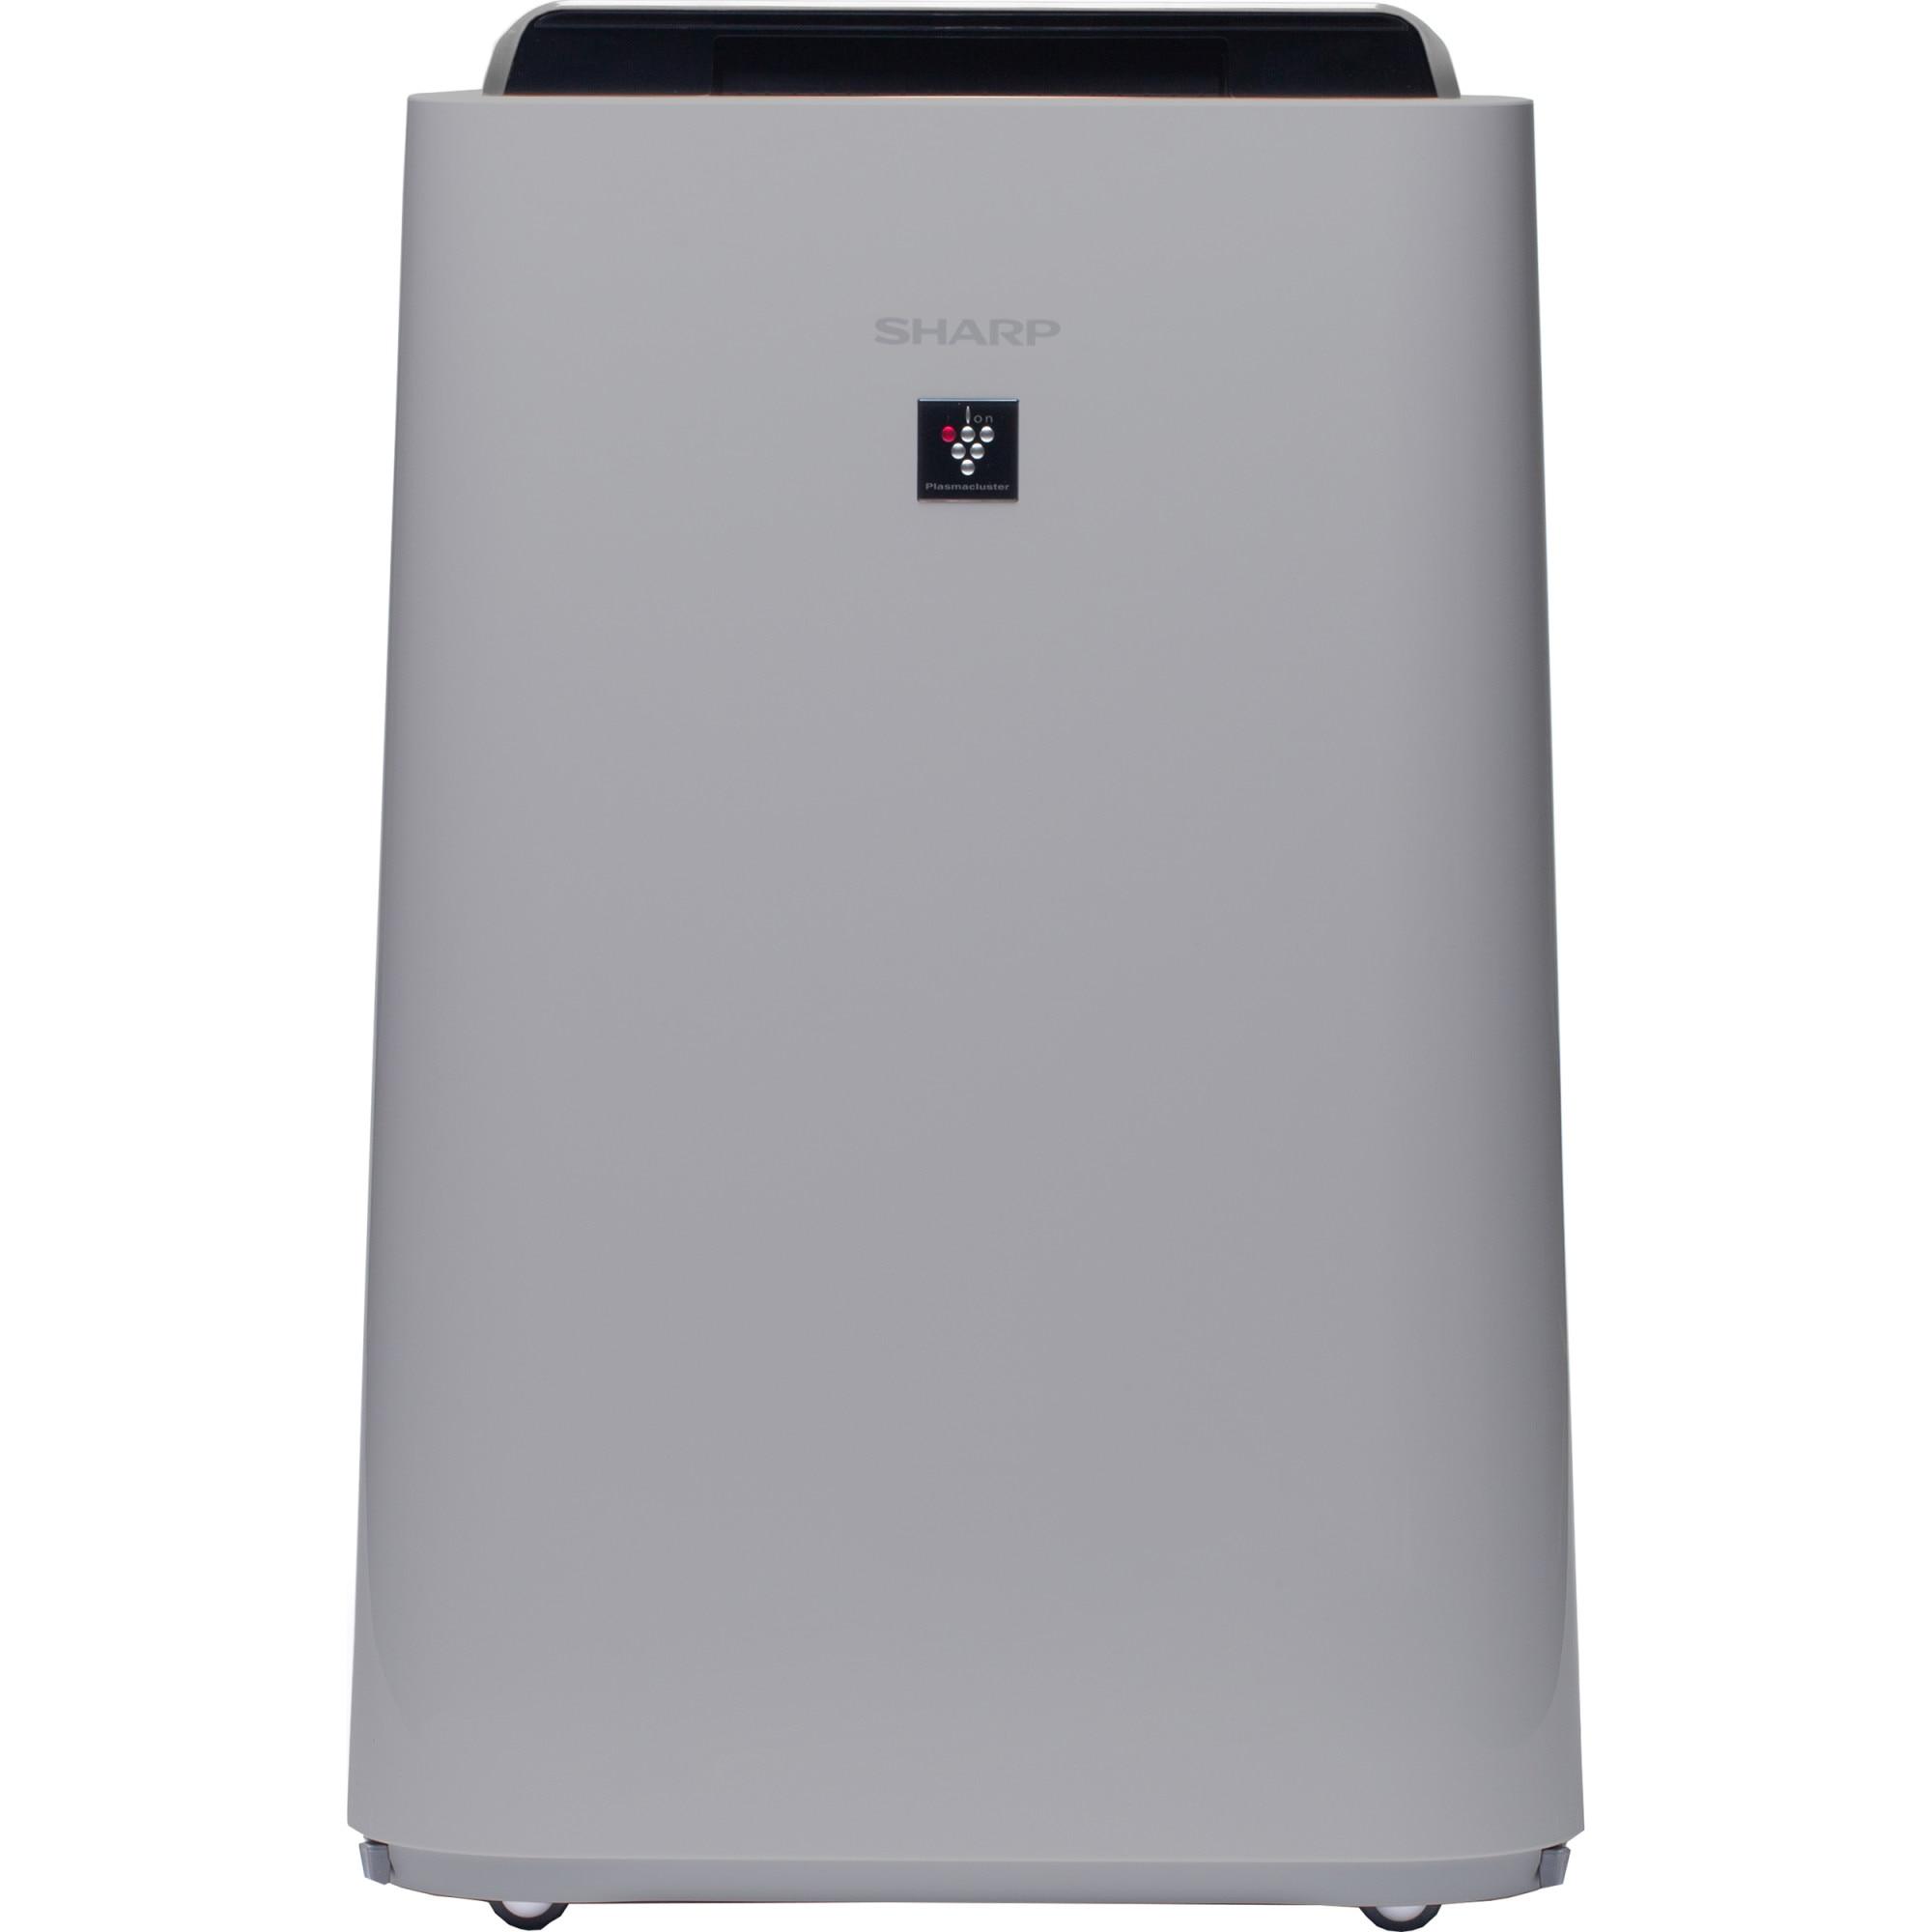 Fotografie Purificator de aer cu umidificator Sharp UA-HD40E-L, 3 modele de filtrare, 4 senzori de praf, Plasmacluster Ion Technology, 26m², alb